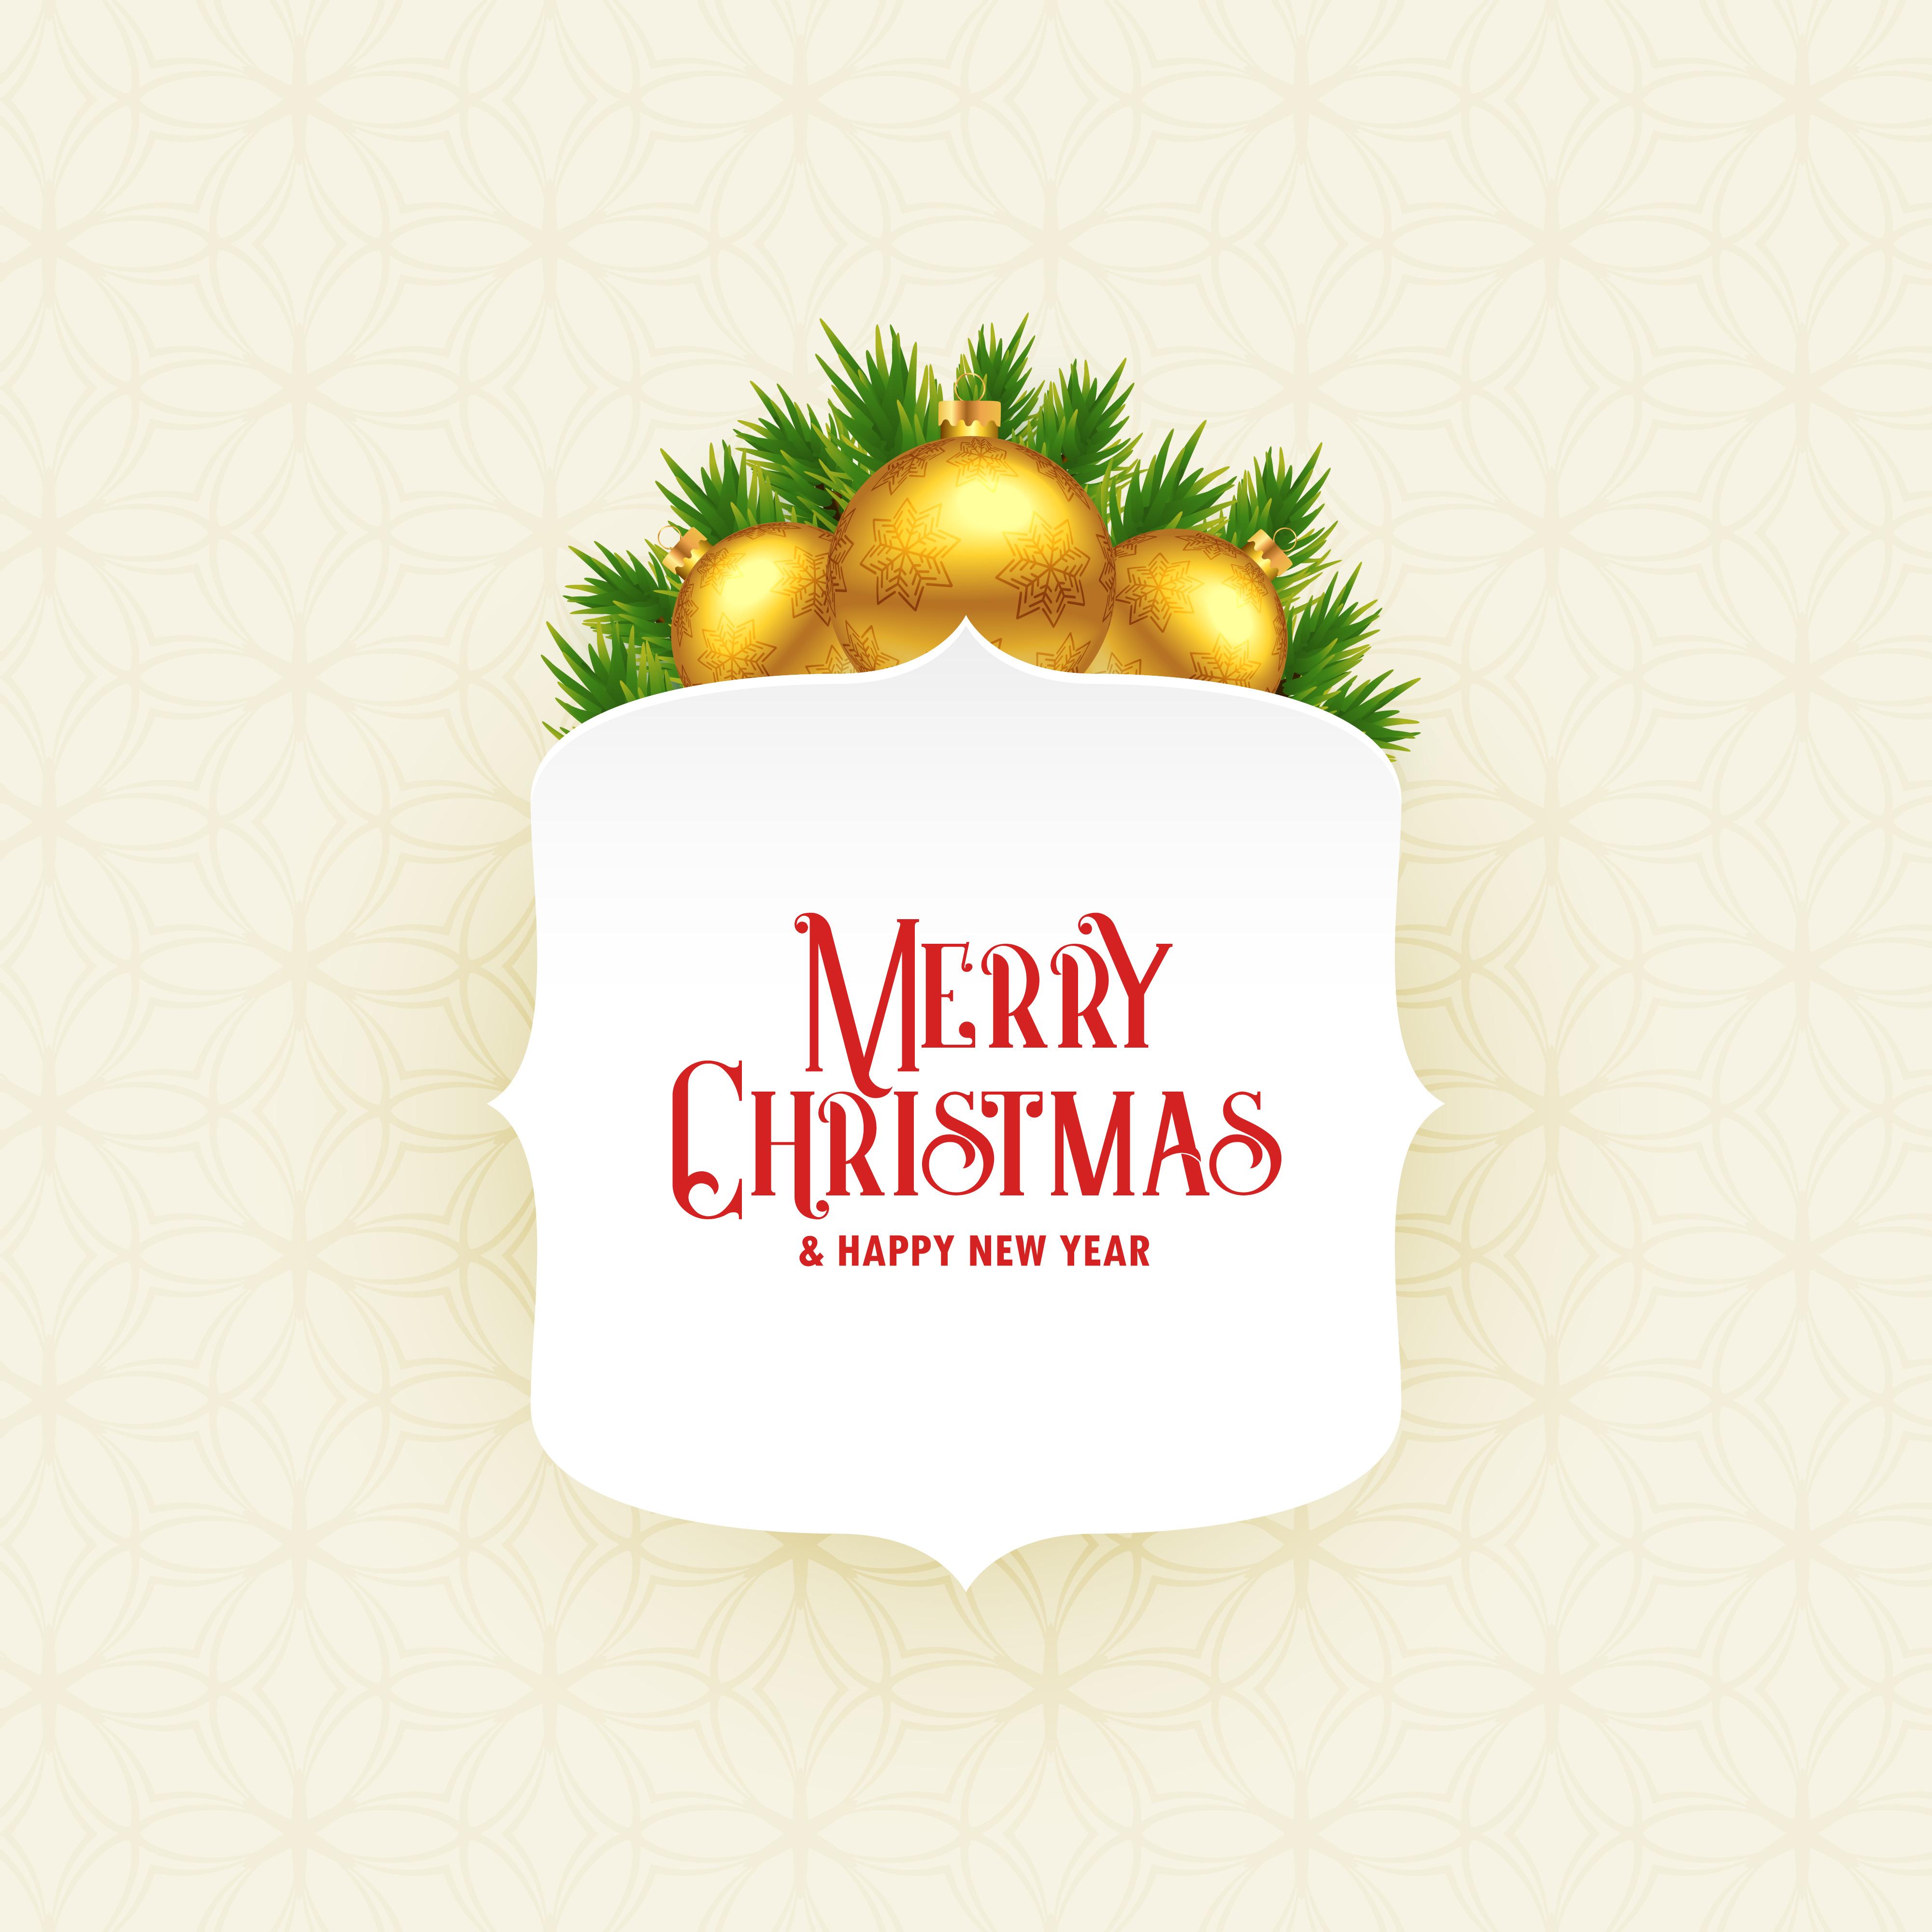 Seasons greetings free vector art 12614 free downloads merry christmas seasonal greeting design illustration kristyandbryce Gallery